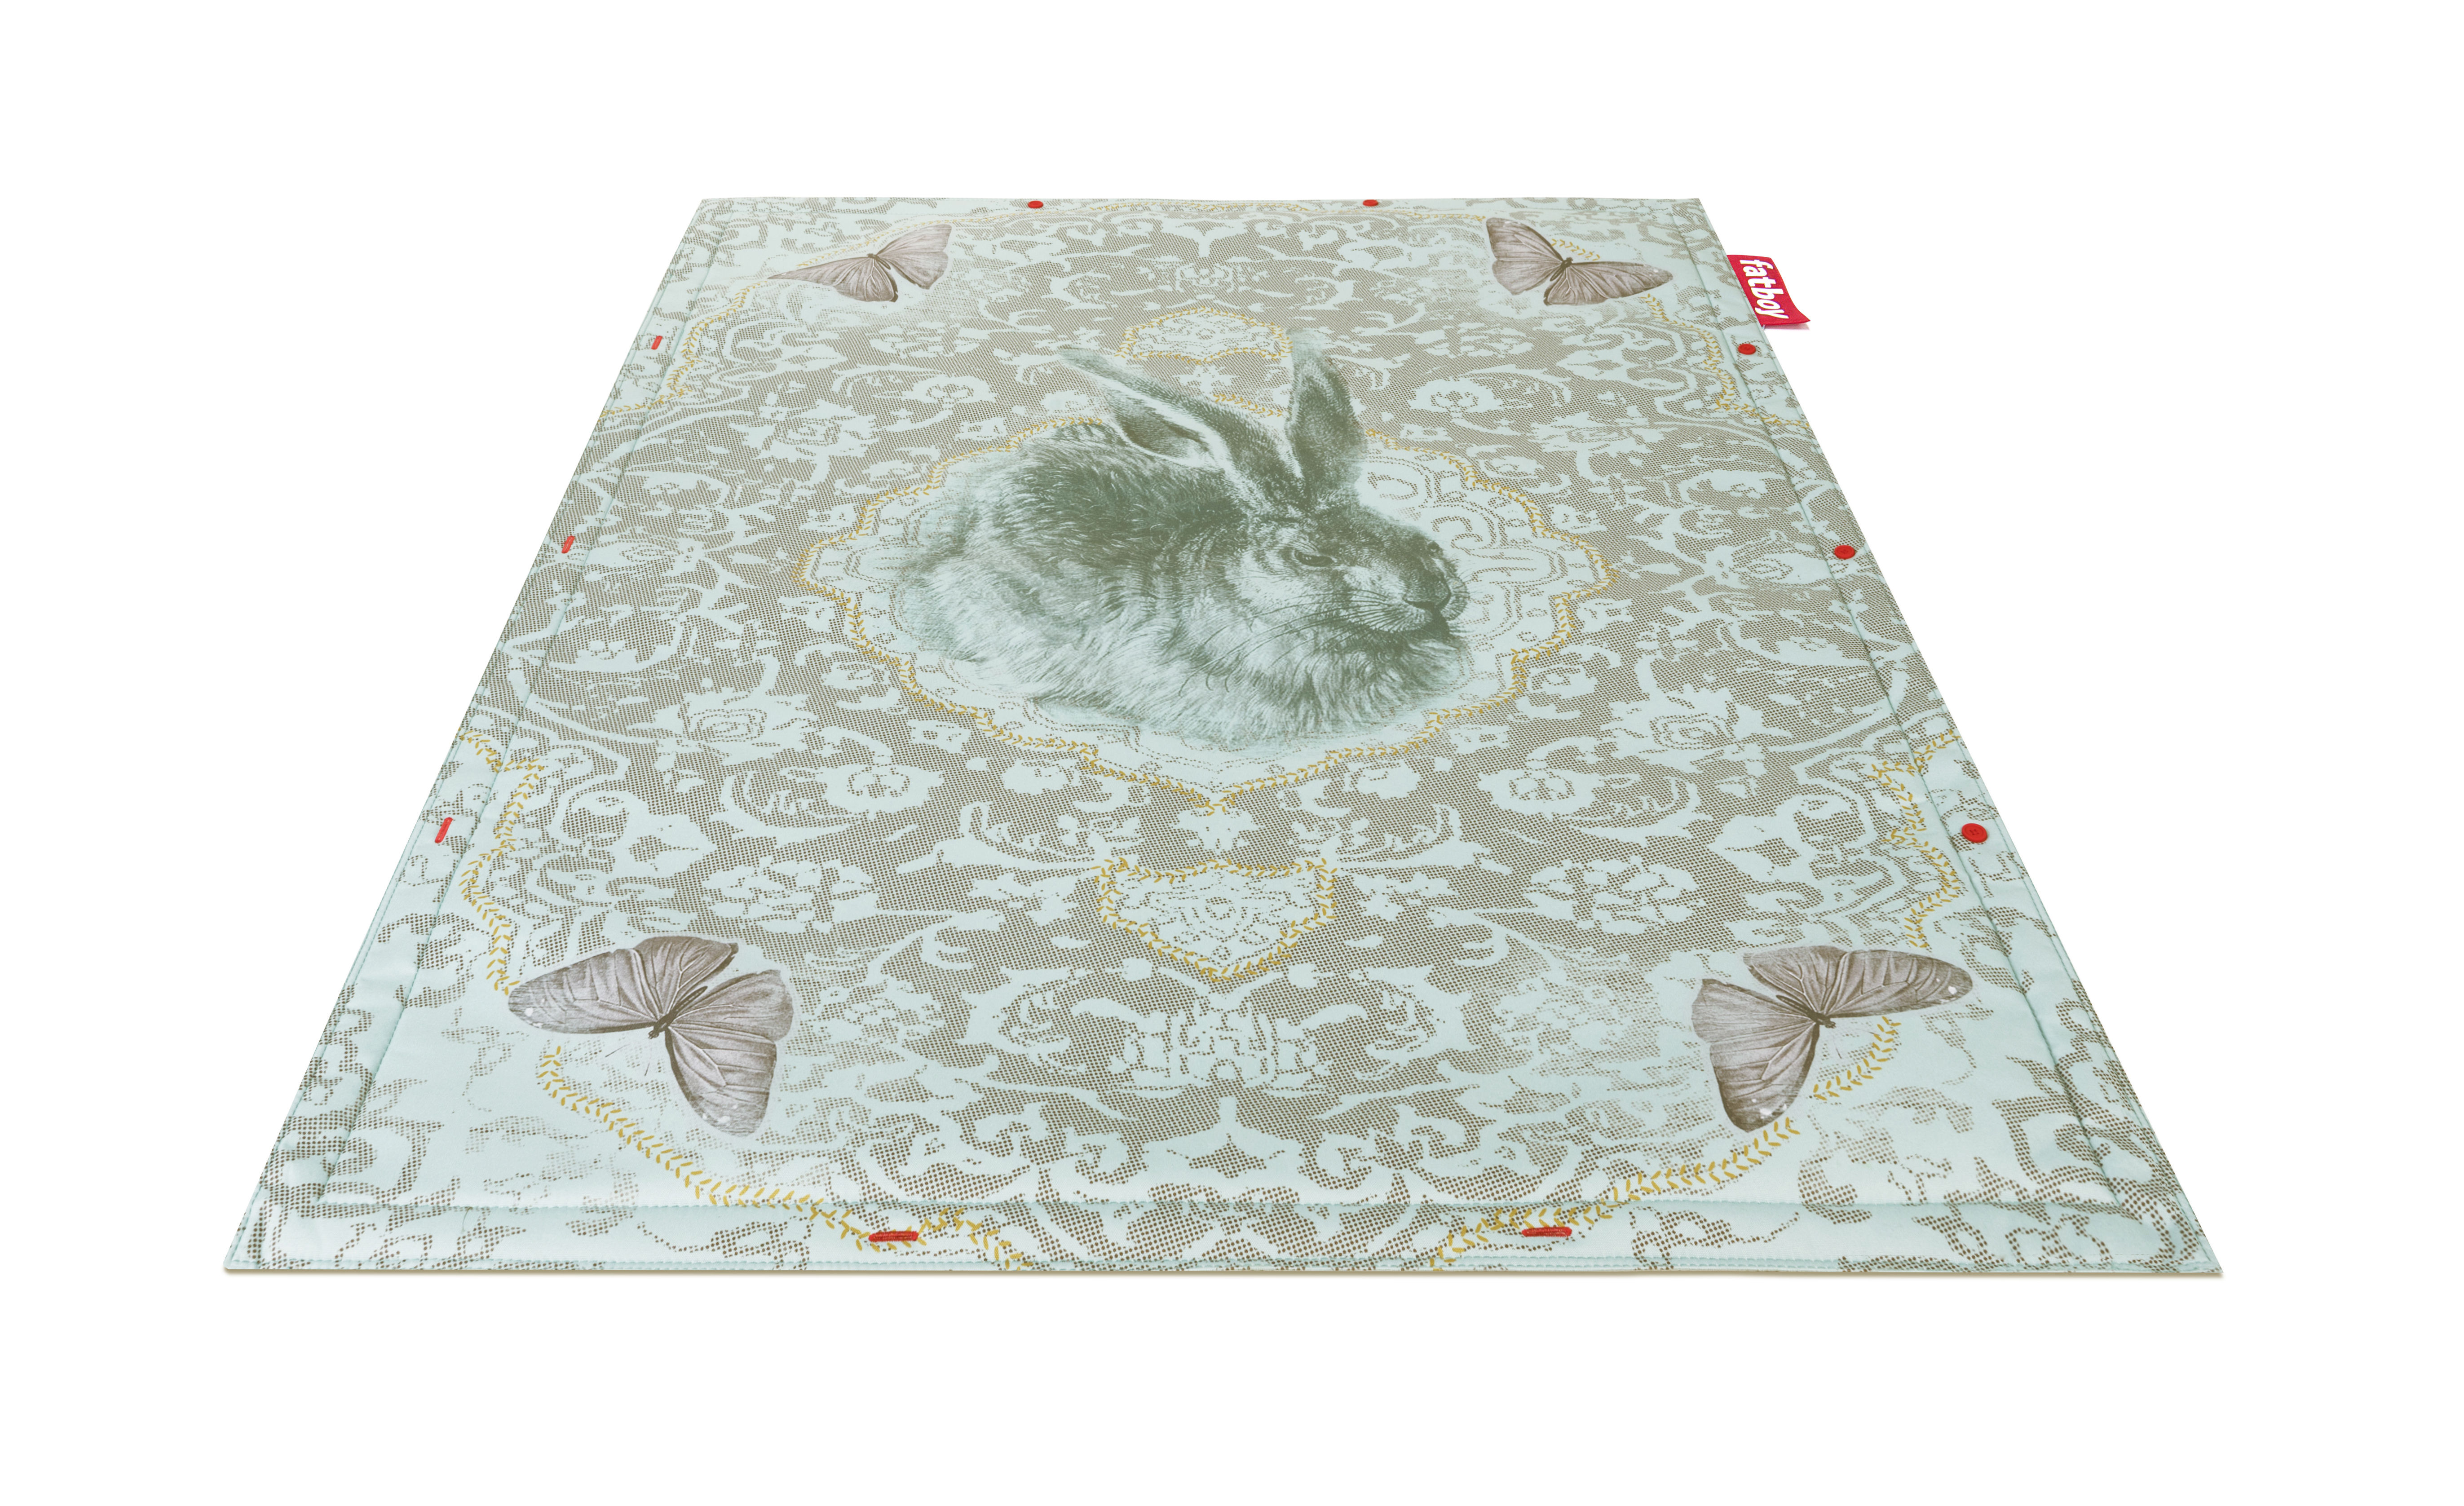 Déco - Tapis - Tapis Non Flying Carpet / Roger - 180 x 140 cm - Fatboy - Lapin / Bleu-vert - Mousse, Tissu polyester